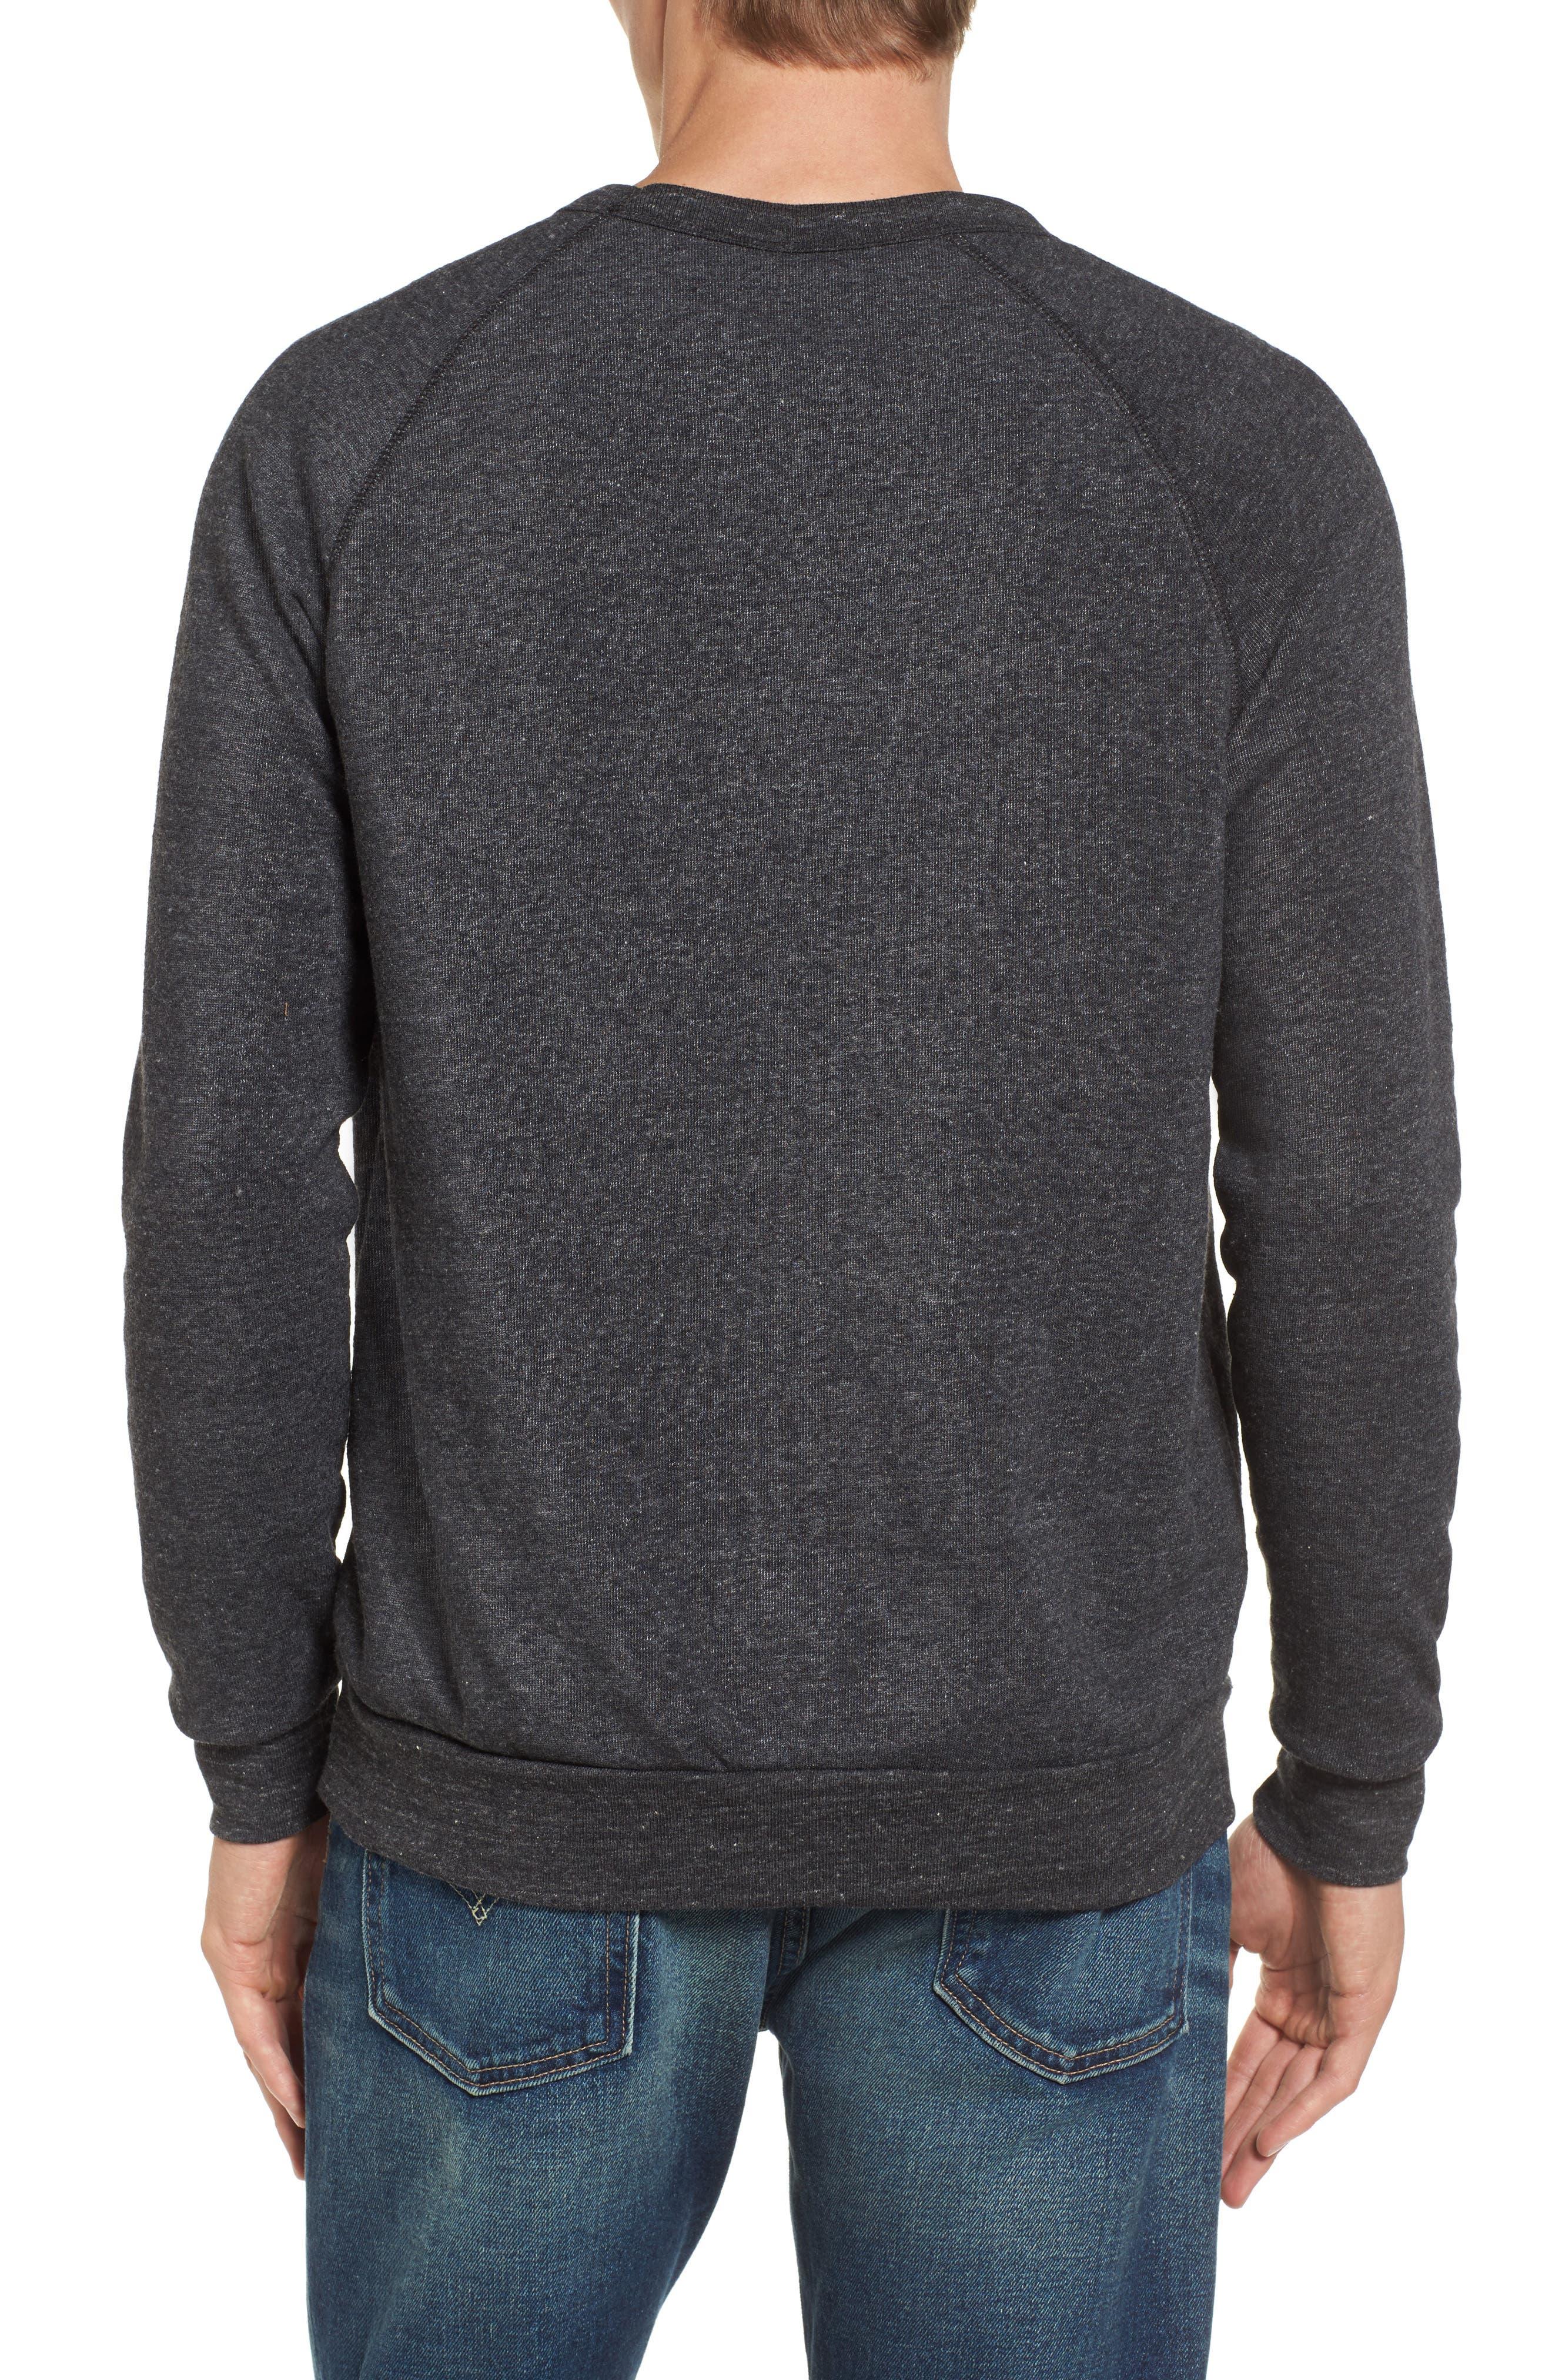 'The Champ' Sweatshirt,                             Alternate thumbnail 2, color,                             010